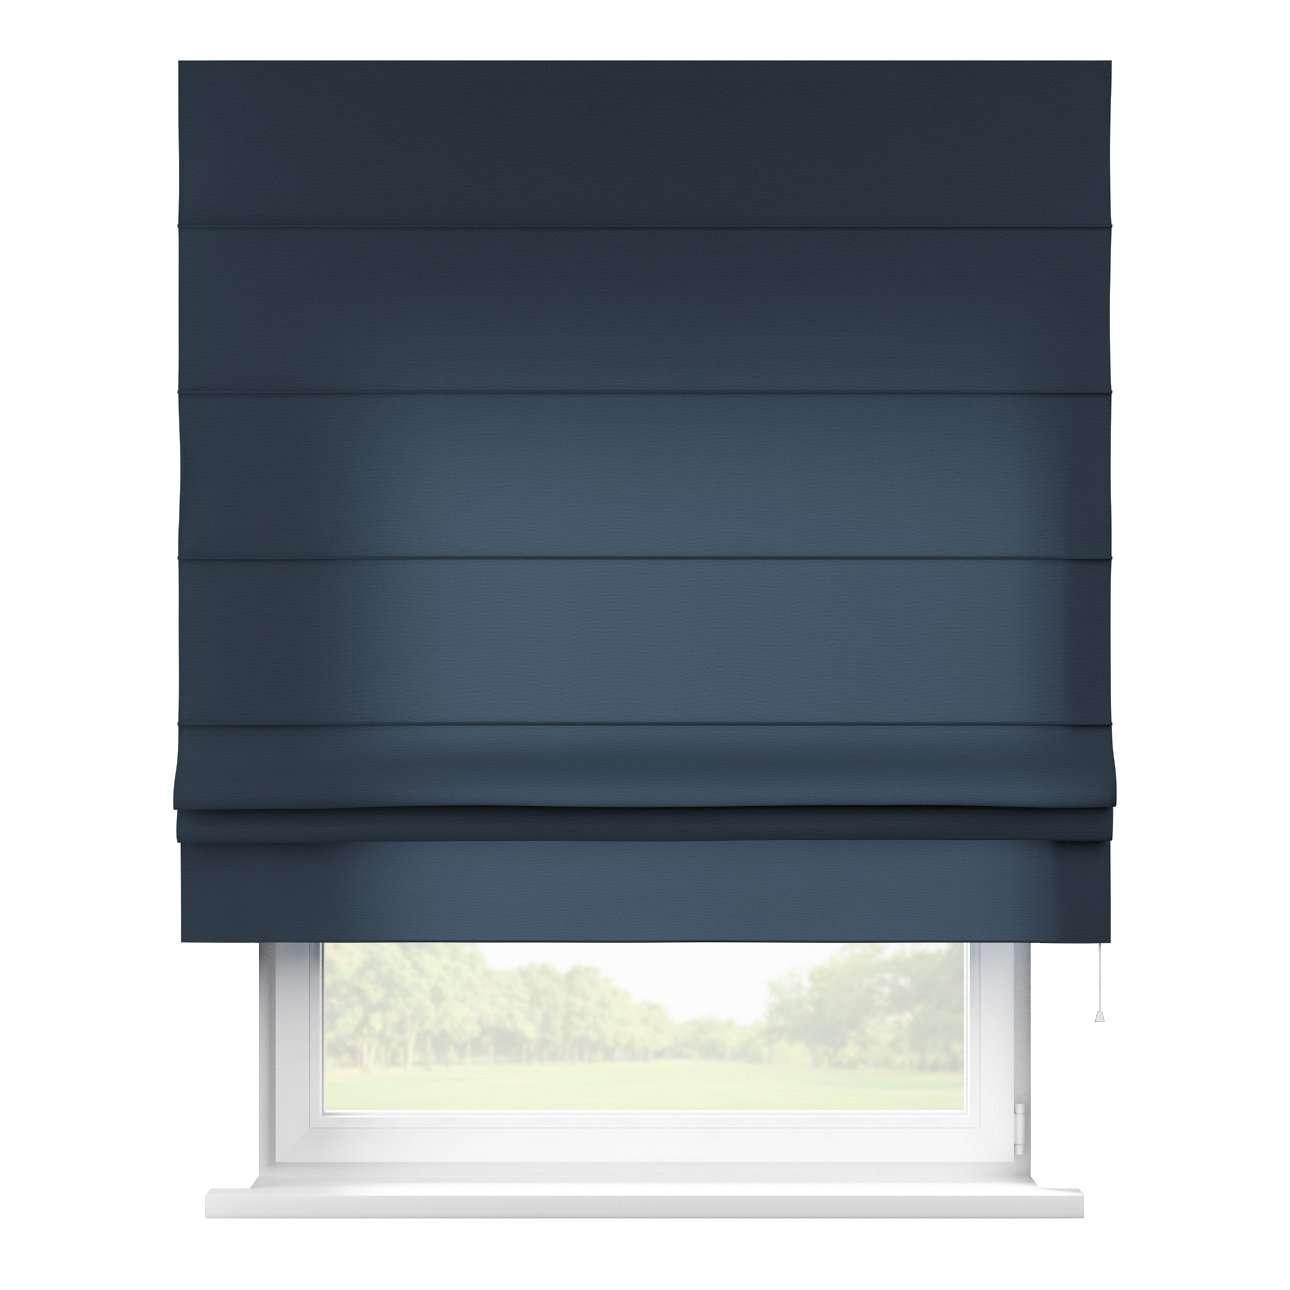 Raffrollo Padva, marinenblau, 160 × 170 cm, Quadro